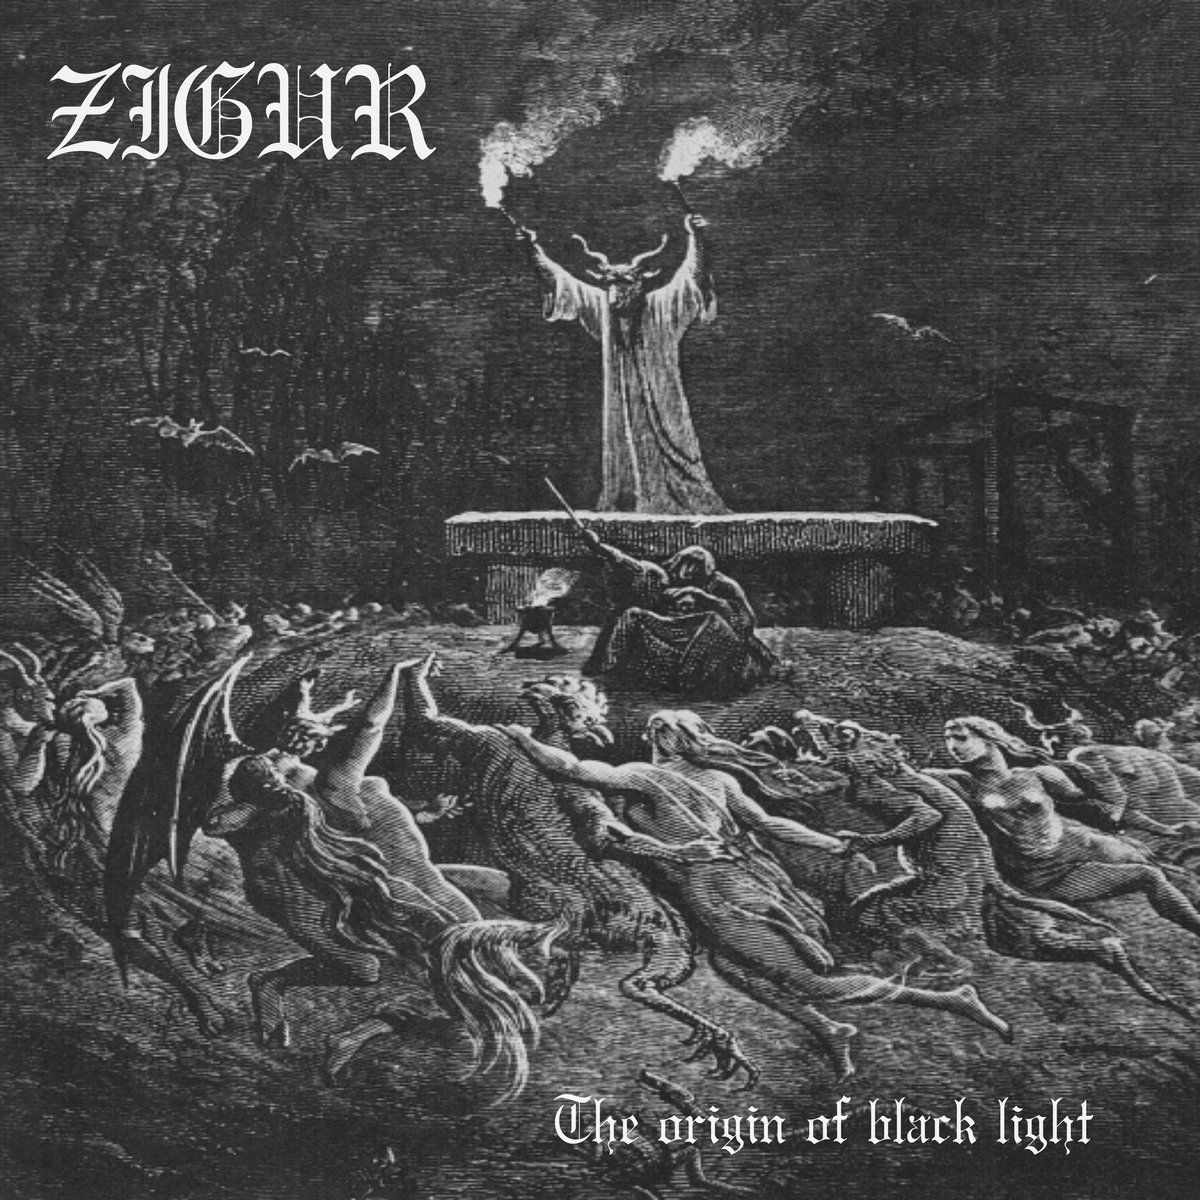 Zigur - The Origin of Black Light